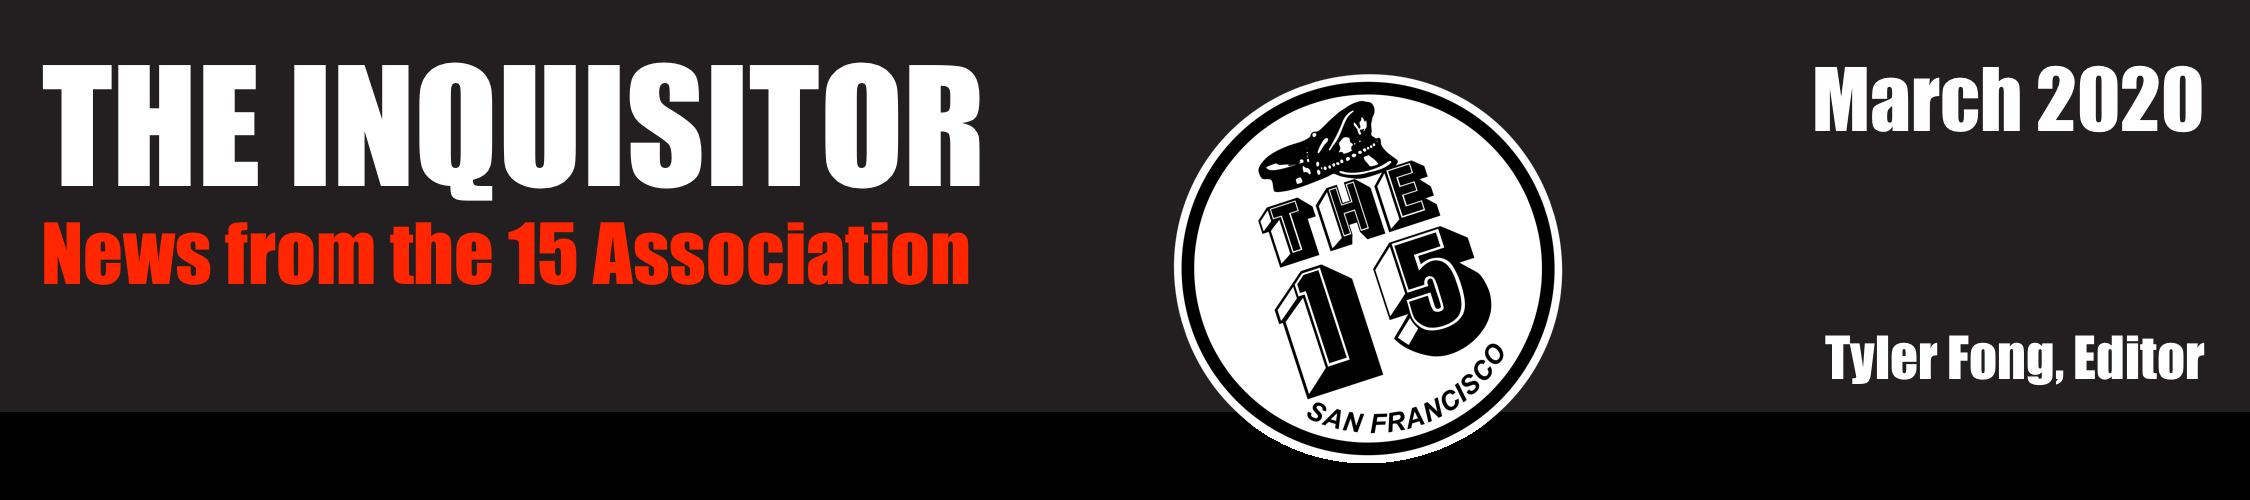 The Inquisitor - Marxh 2020